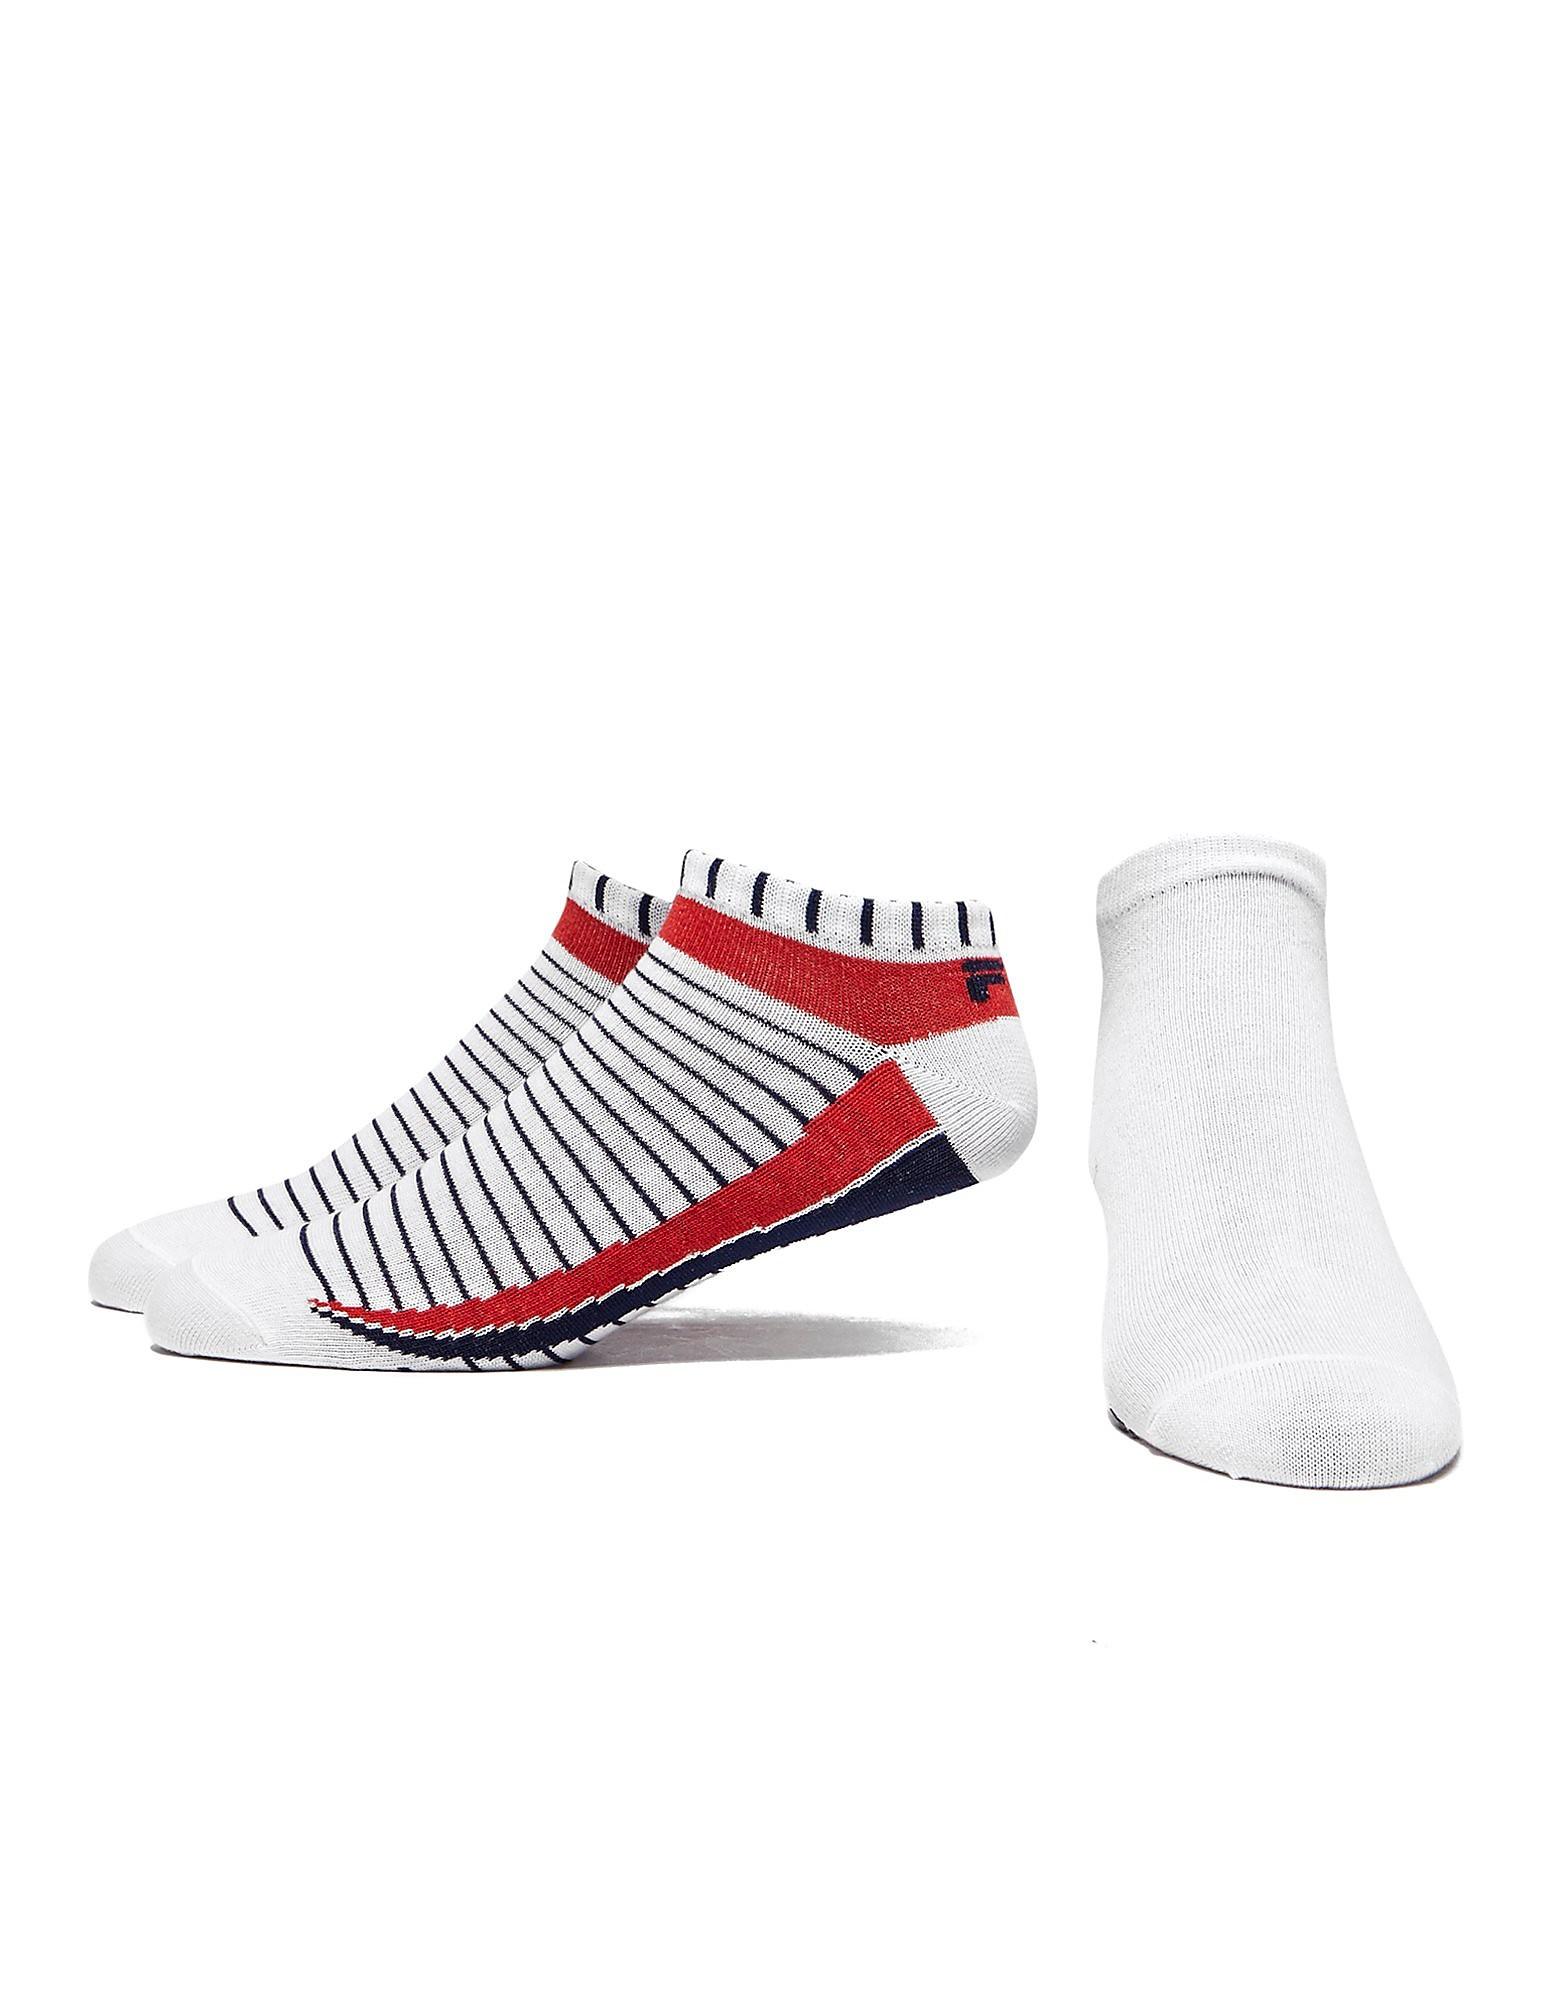 Fila 3 Pack Low Ped Socks